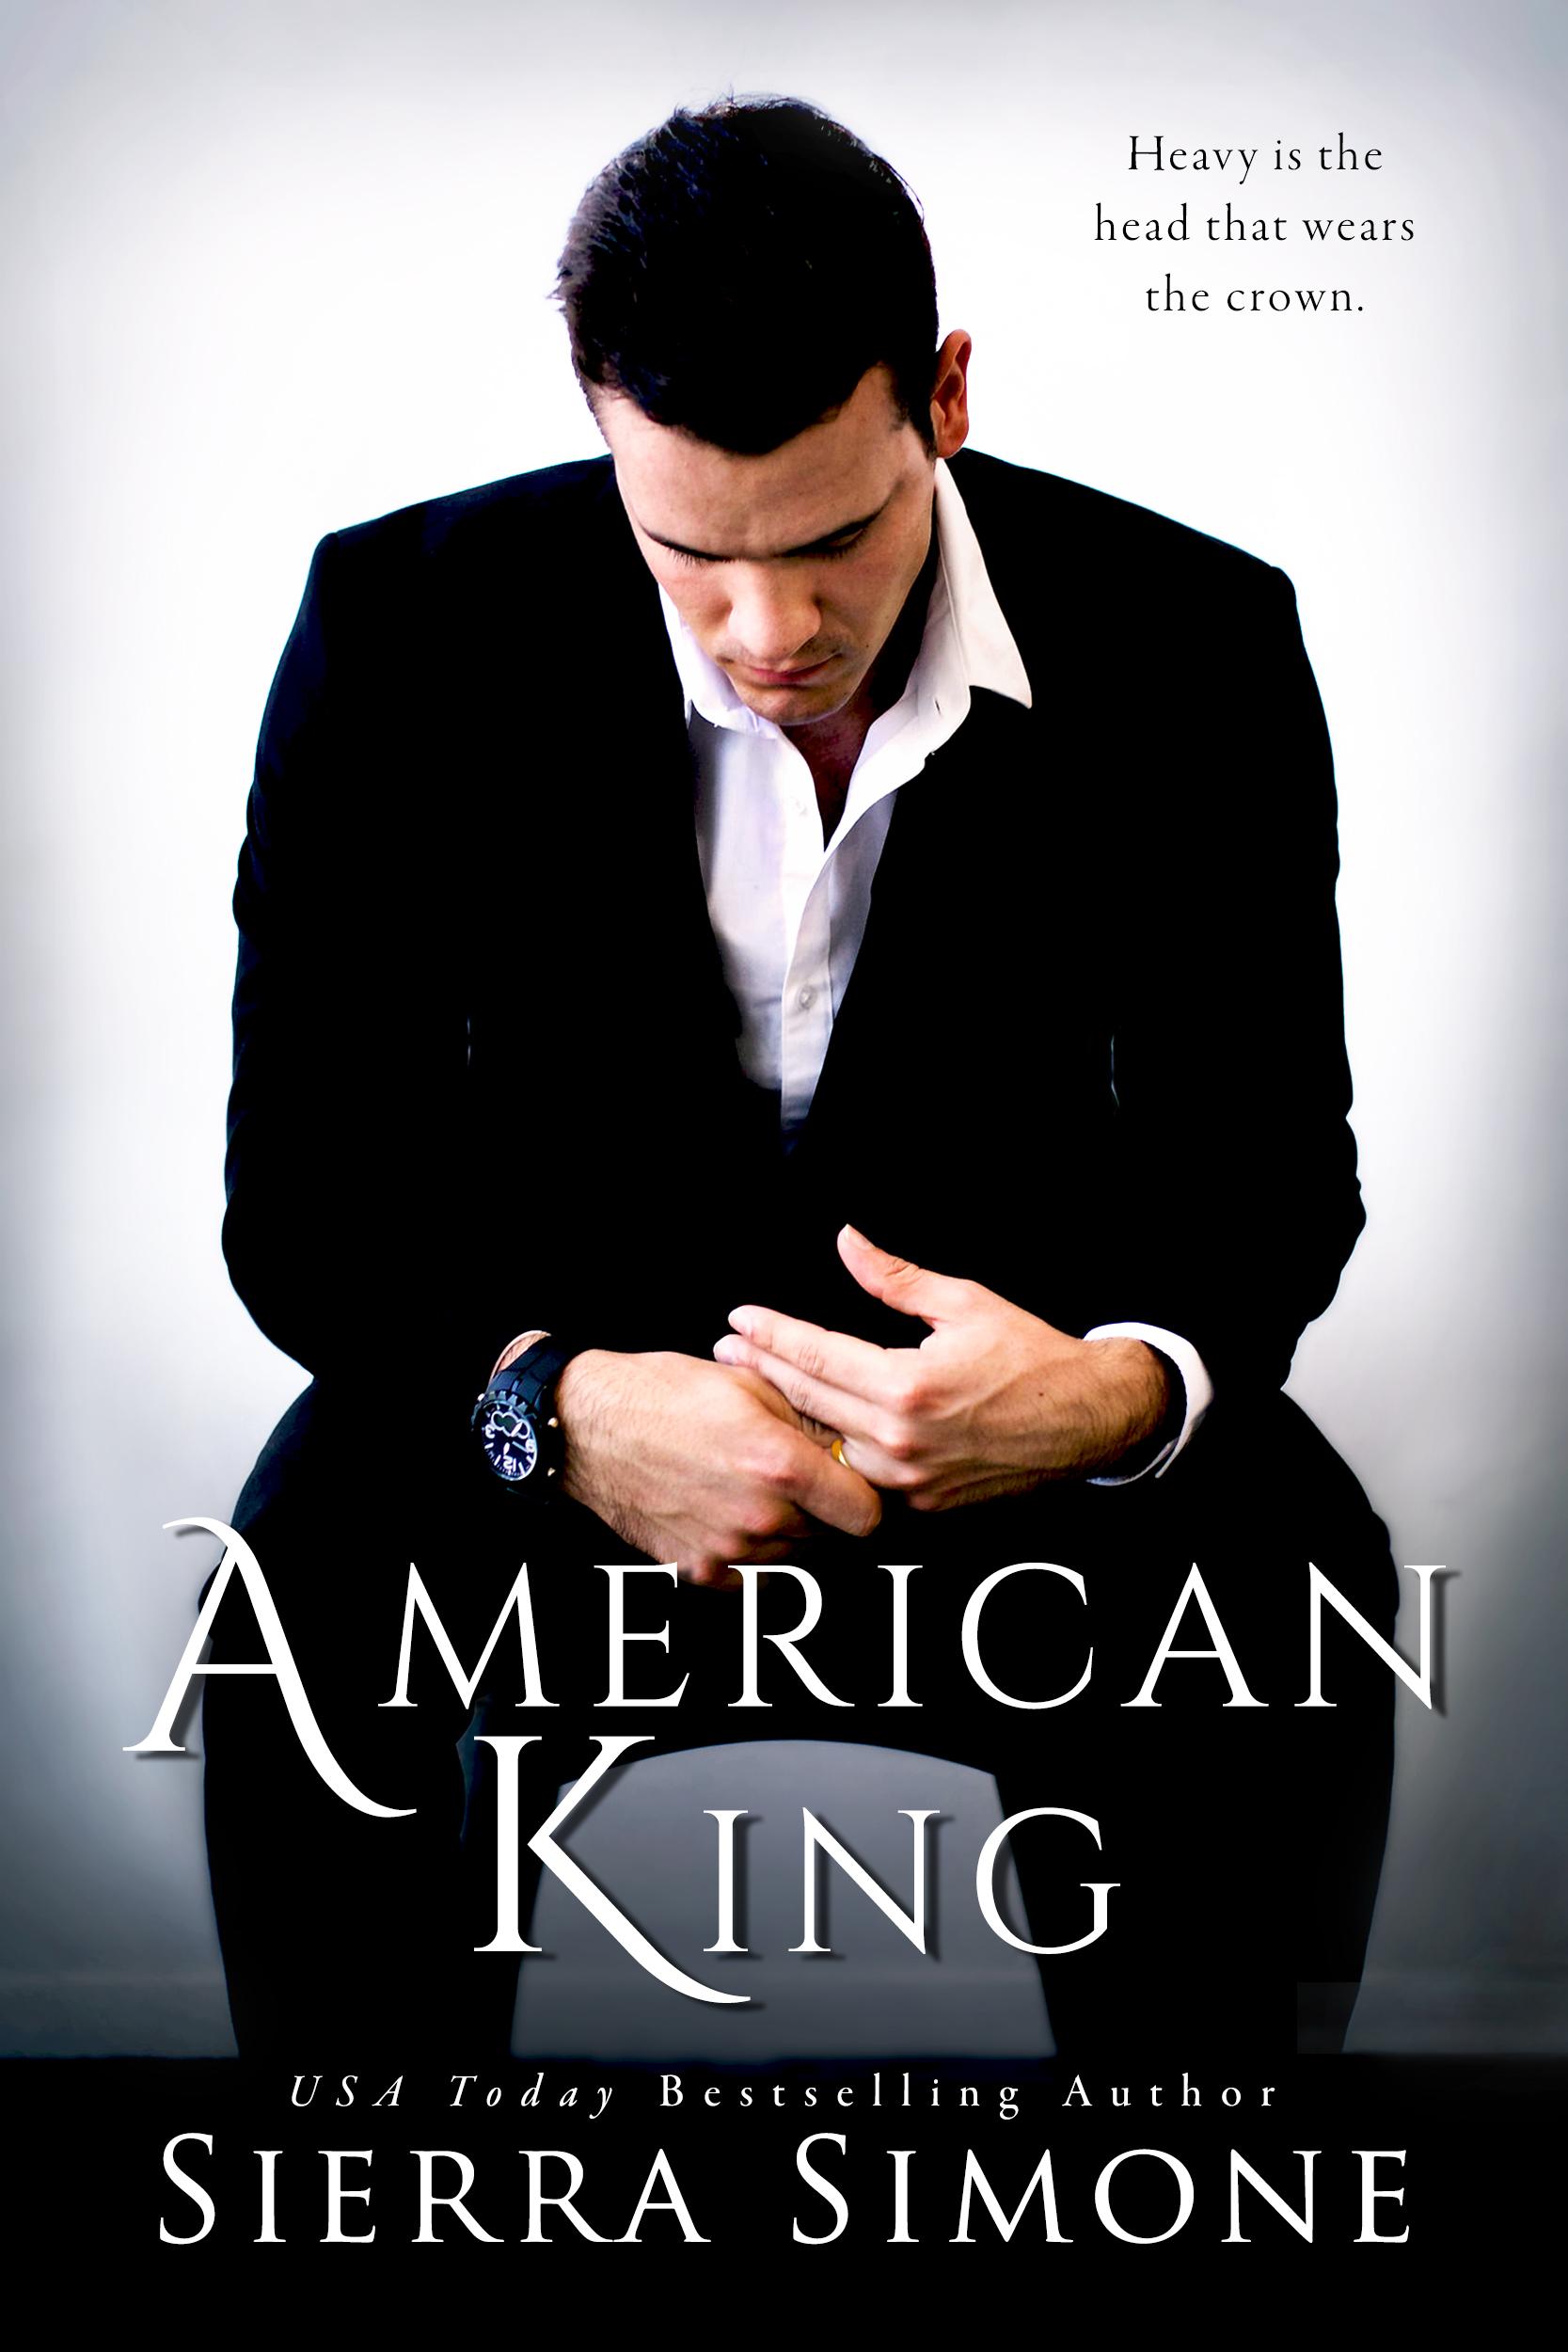 American King by Sierra Simone